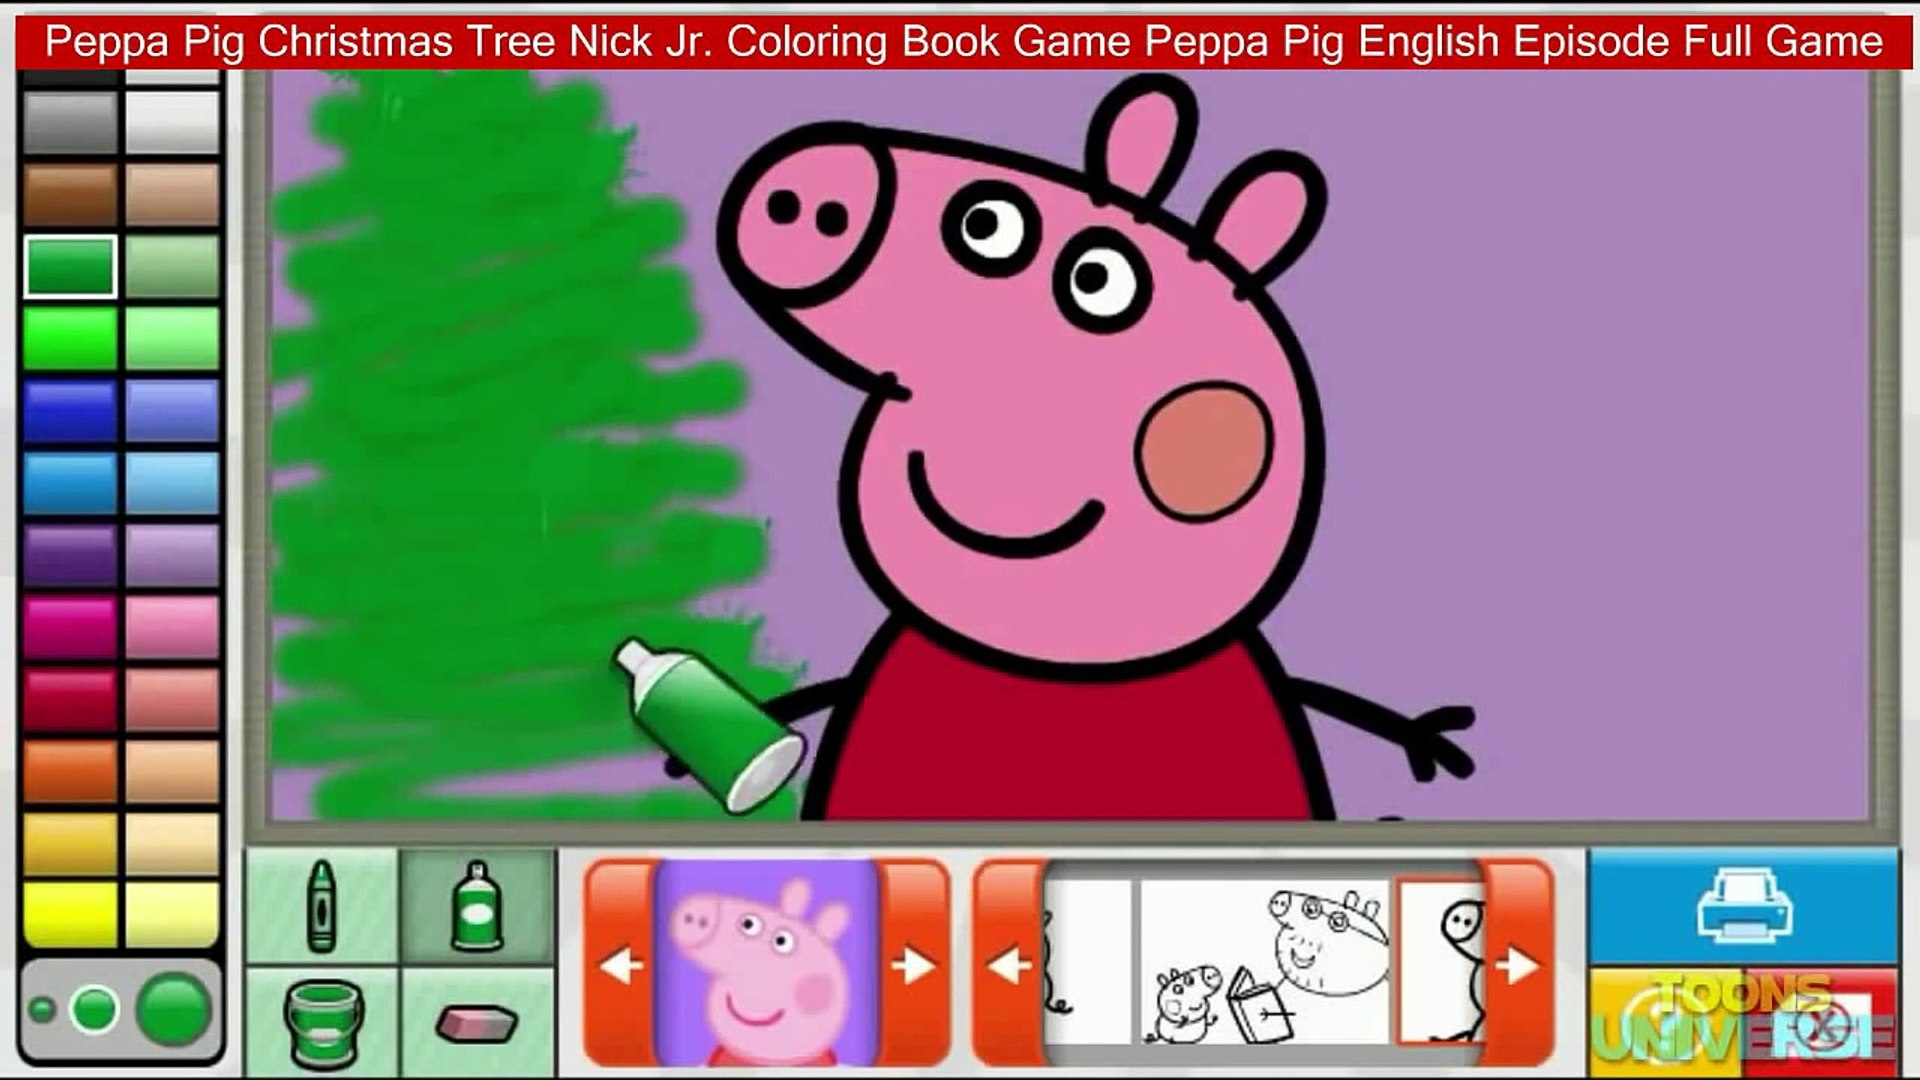 - Peppa Pig Christmas Tree Nick Jr. Coloring Book Game Peppa Pig